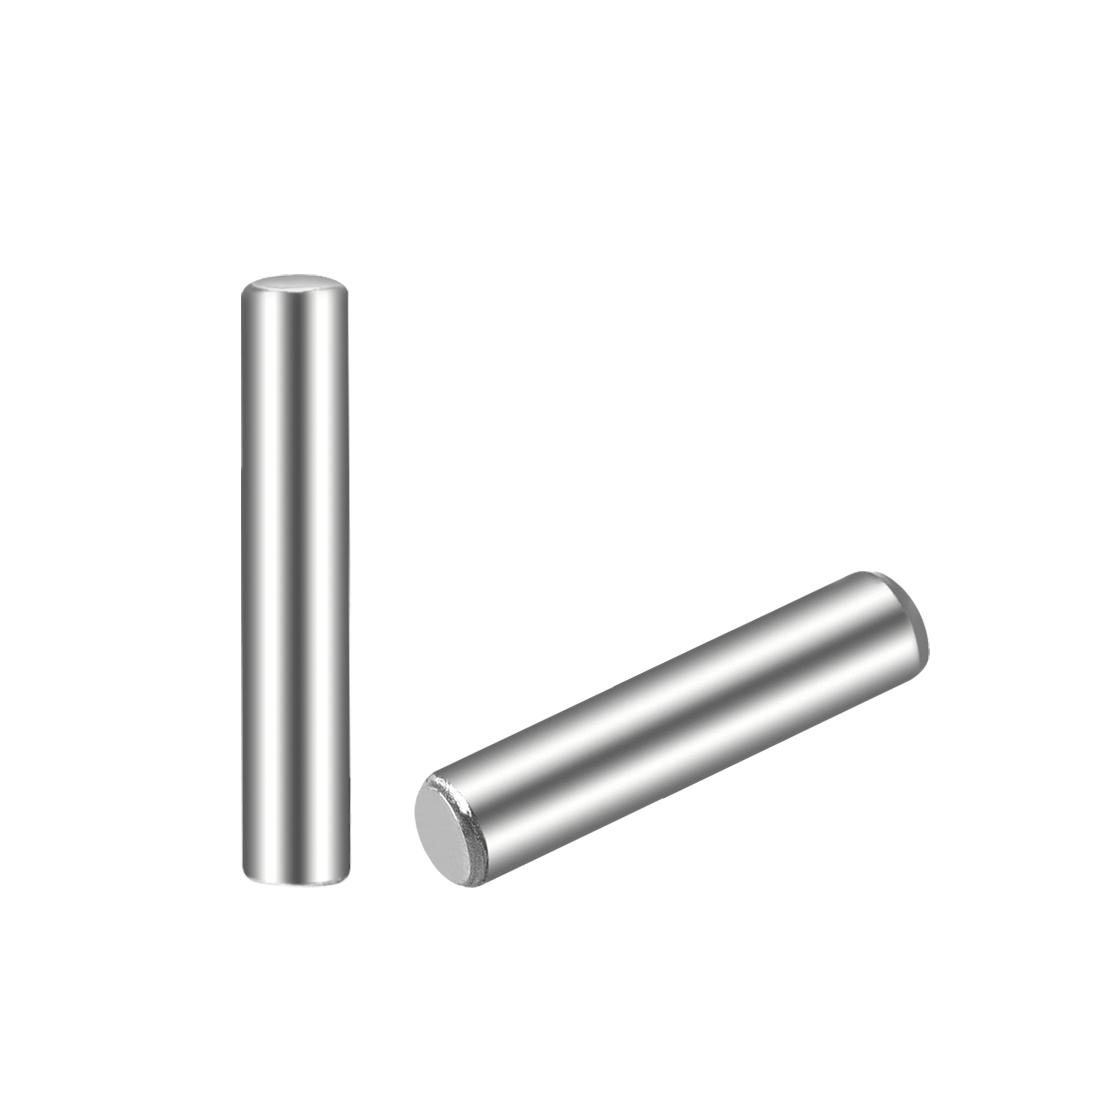 25Pcs 2.5mm x 14mm Dowel Pin 304 Stainless Steel Shelf Support Pin Fasten